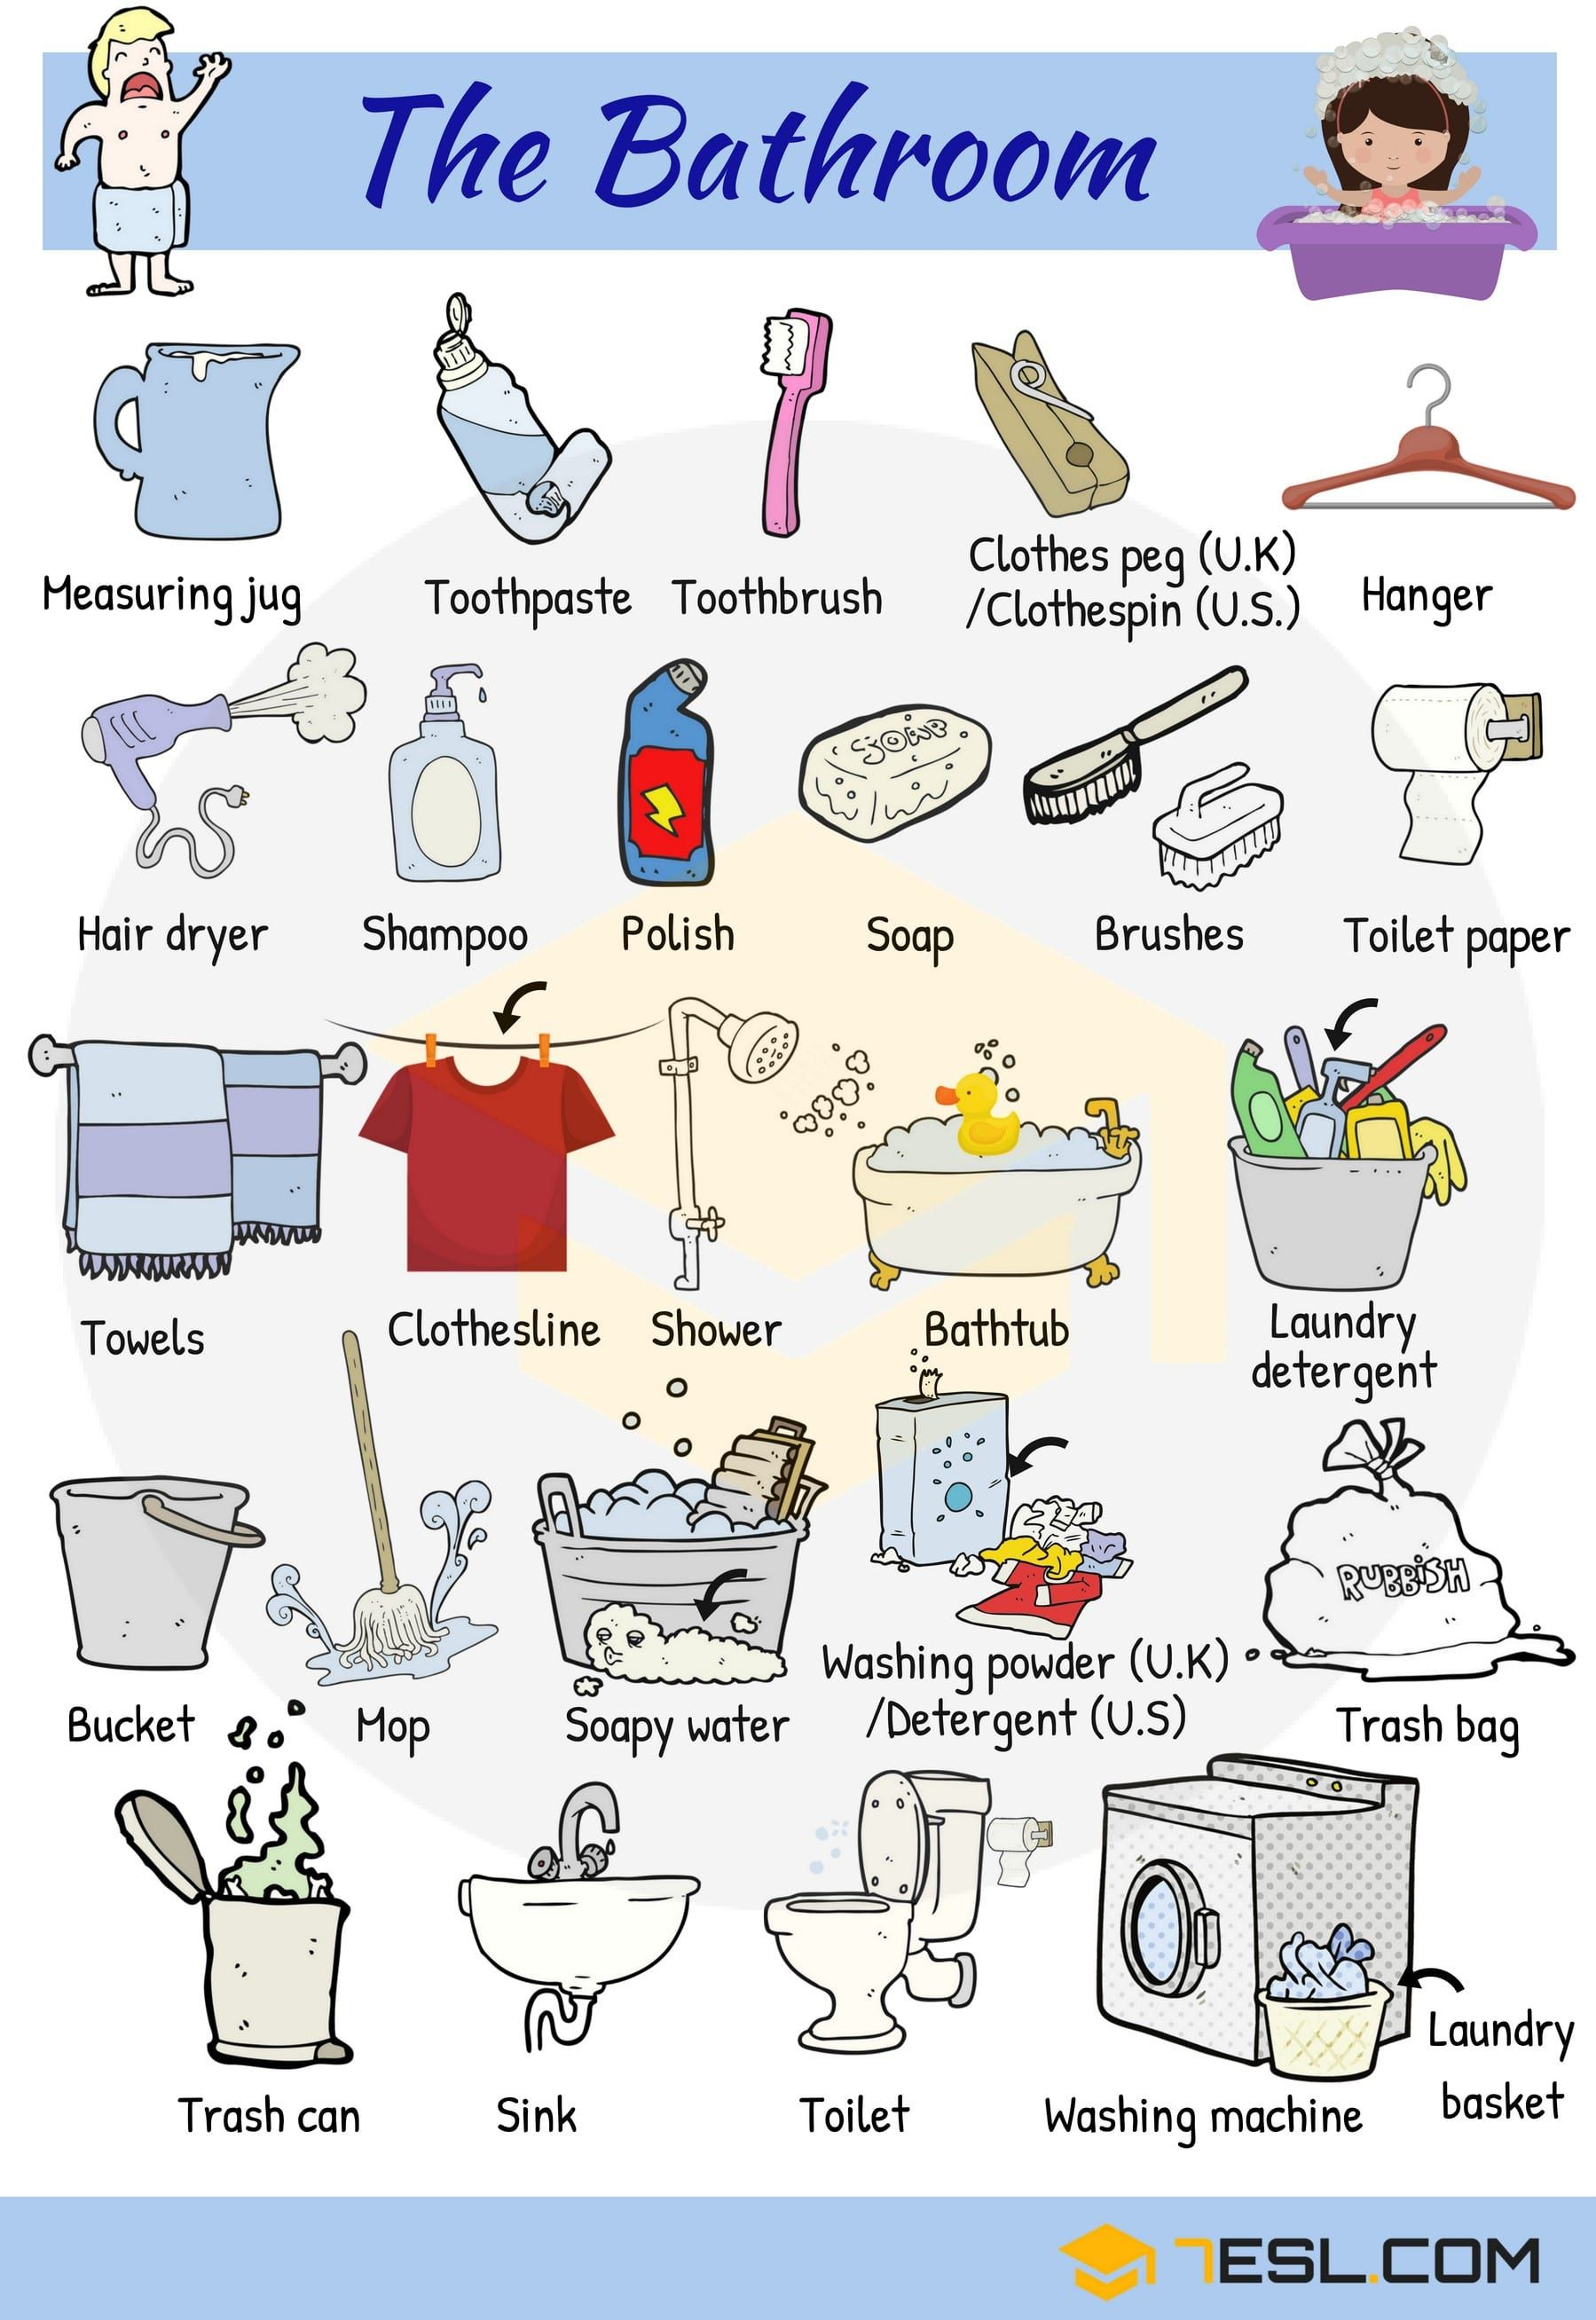 Bathroom Vocabulary Bathroom Accessories Furniture 7esl English Vocabulary English Language Learning Learn English Vocabulary